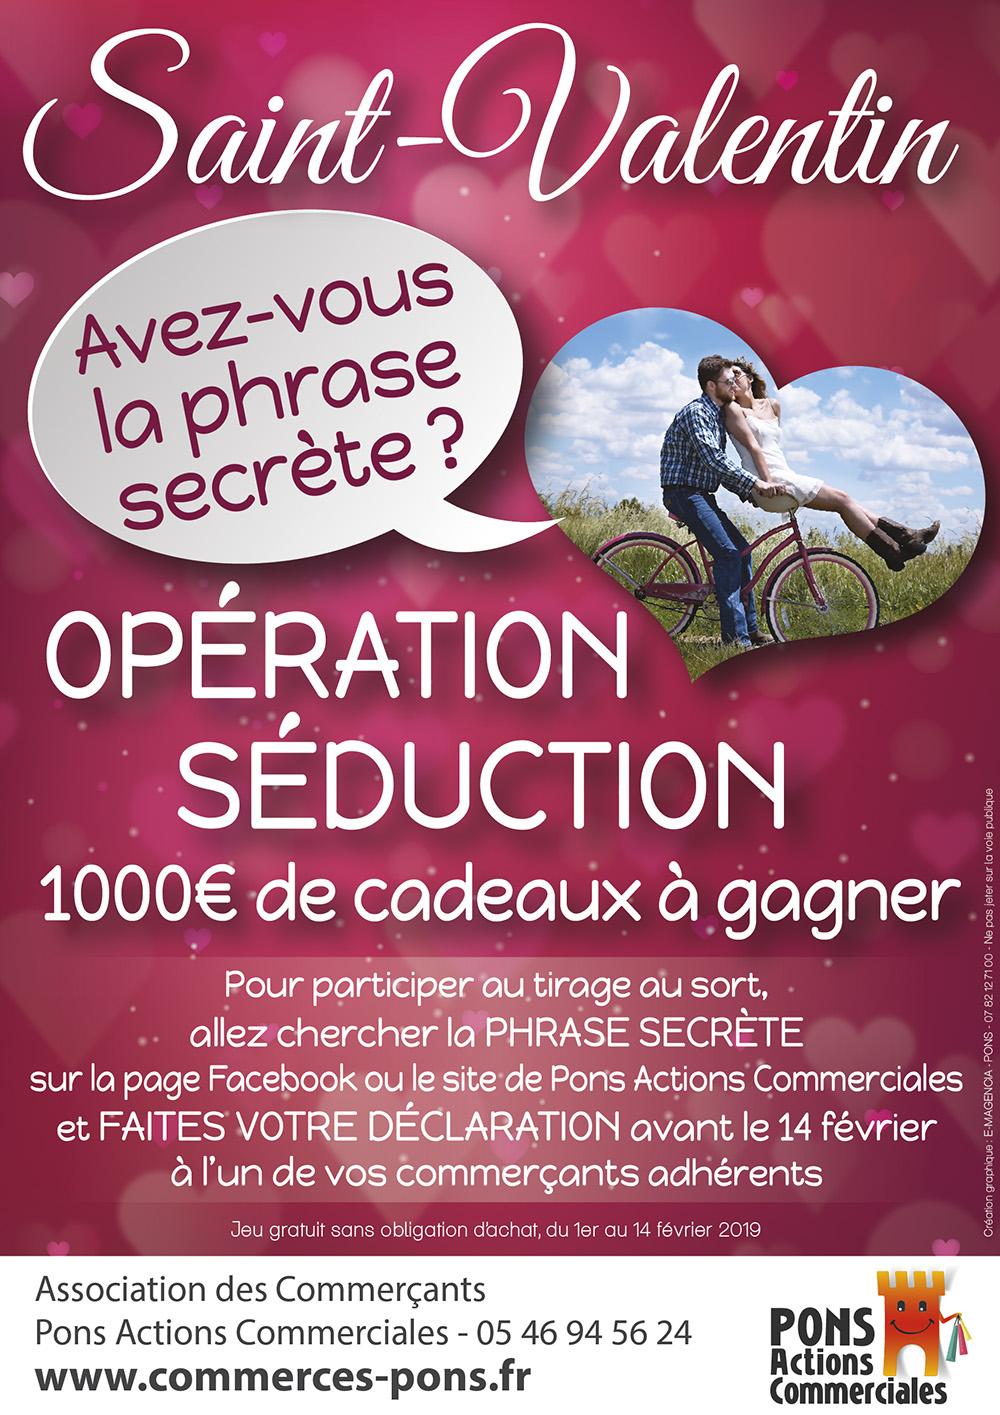 GICC Pons - Opération Saint Valentin 2018